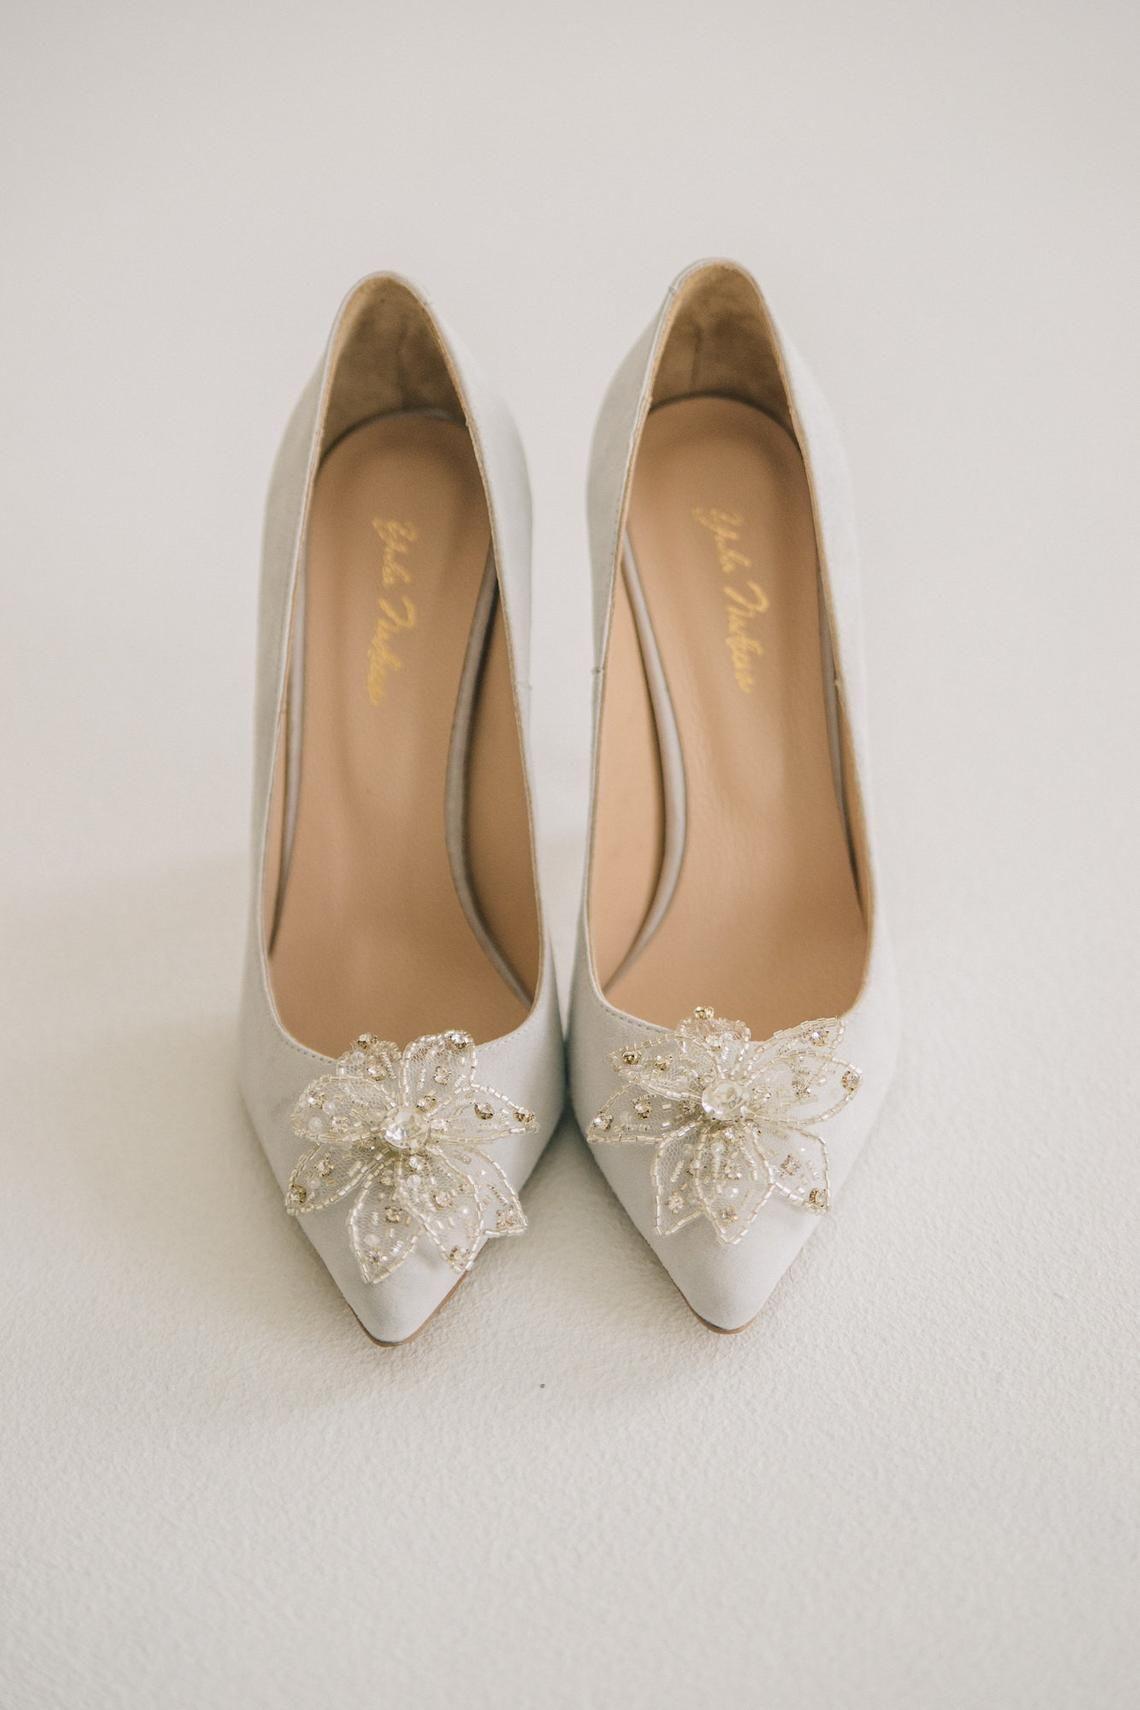 Wedding Shoes White Wedding Shoes Bridal Shoes Wedding Etsy In 2021 Bohemian Wedding Shoes Mint Wedding Shoes Bridal Shoes